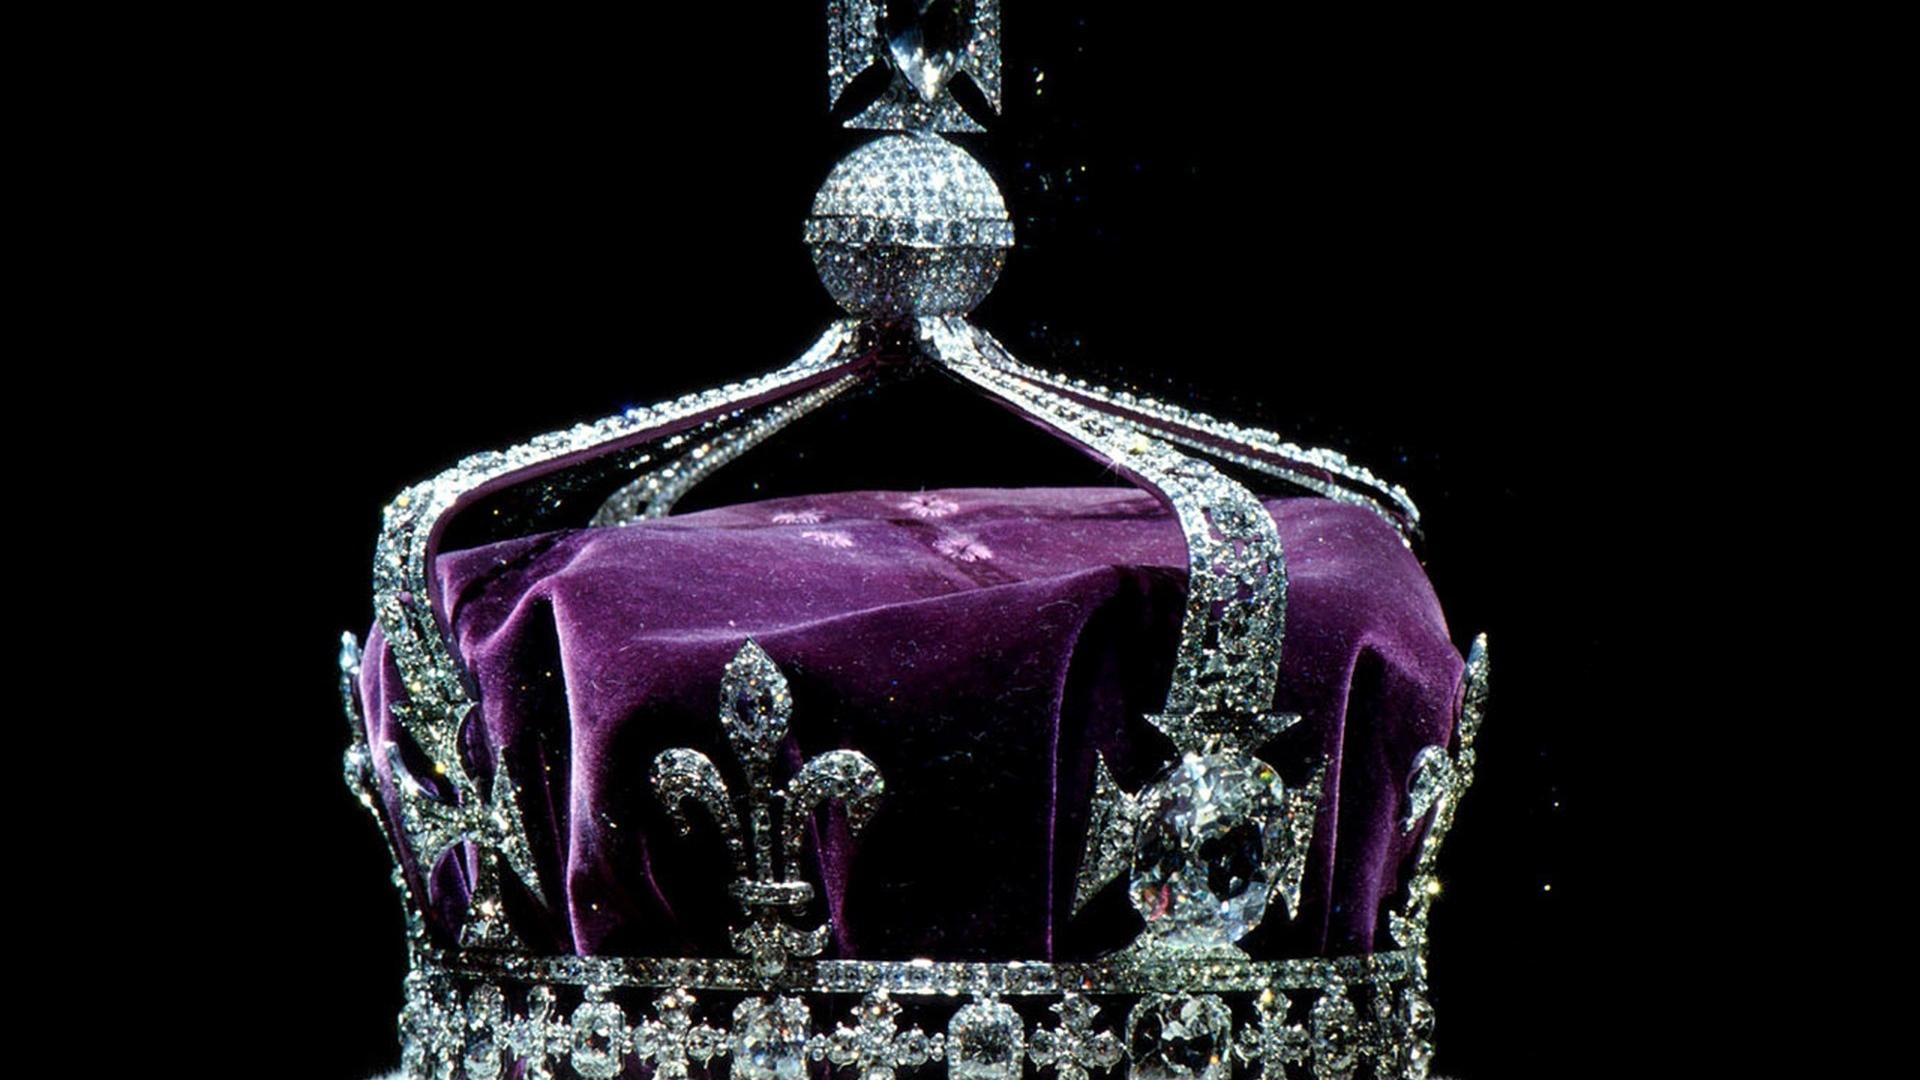 Download Wallpaper 1920x1080 Crown Diamonds Jewelry Full Hd